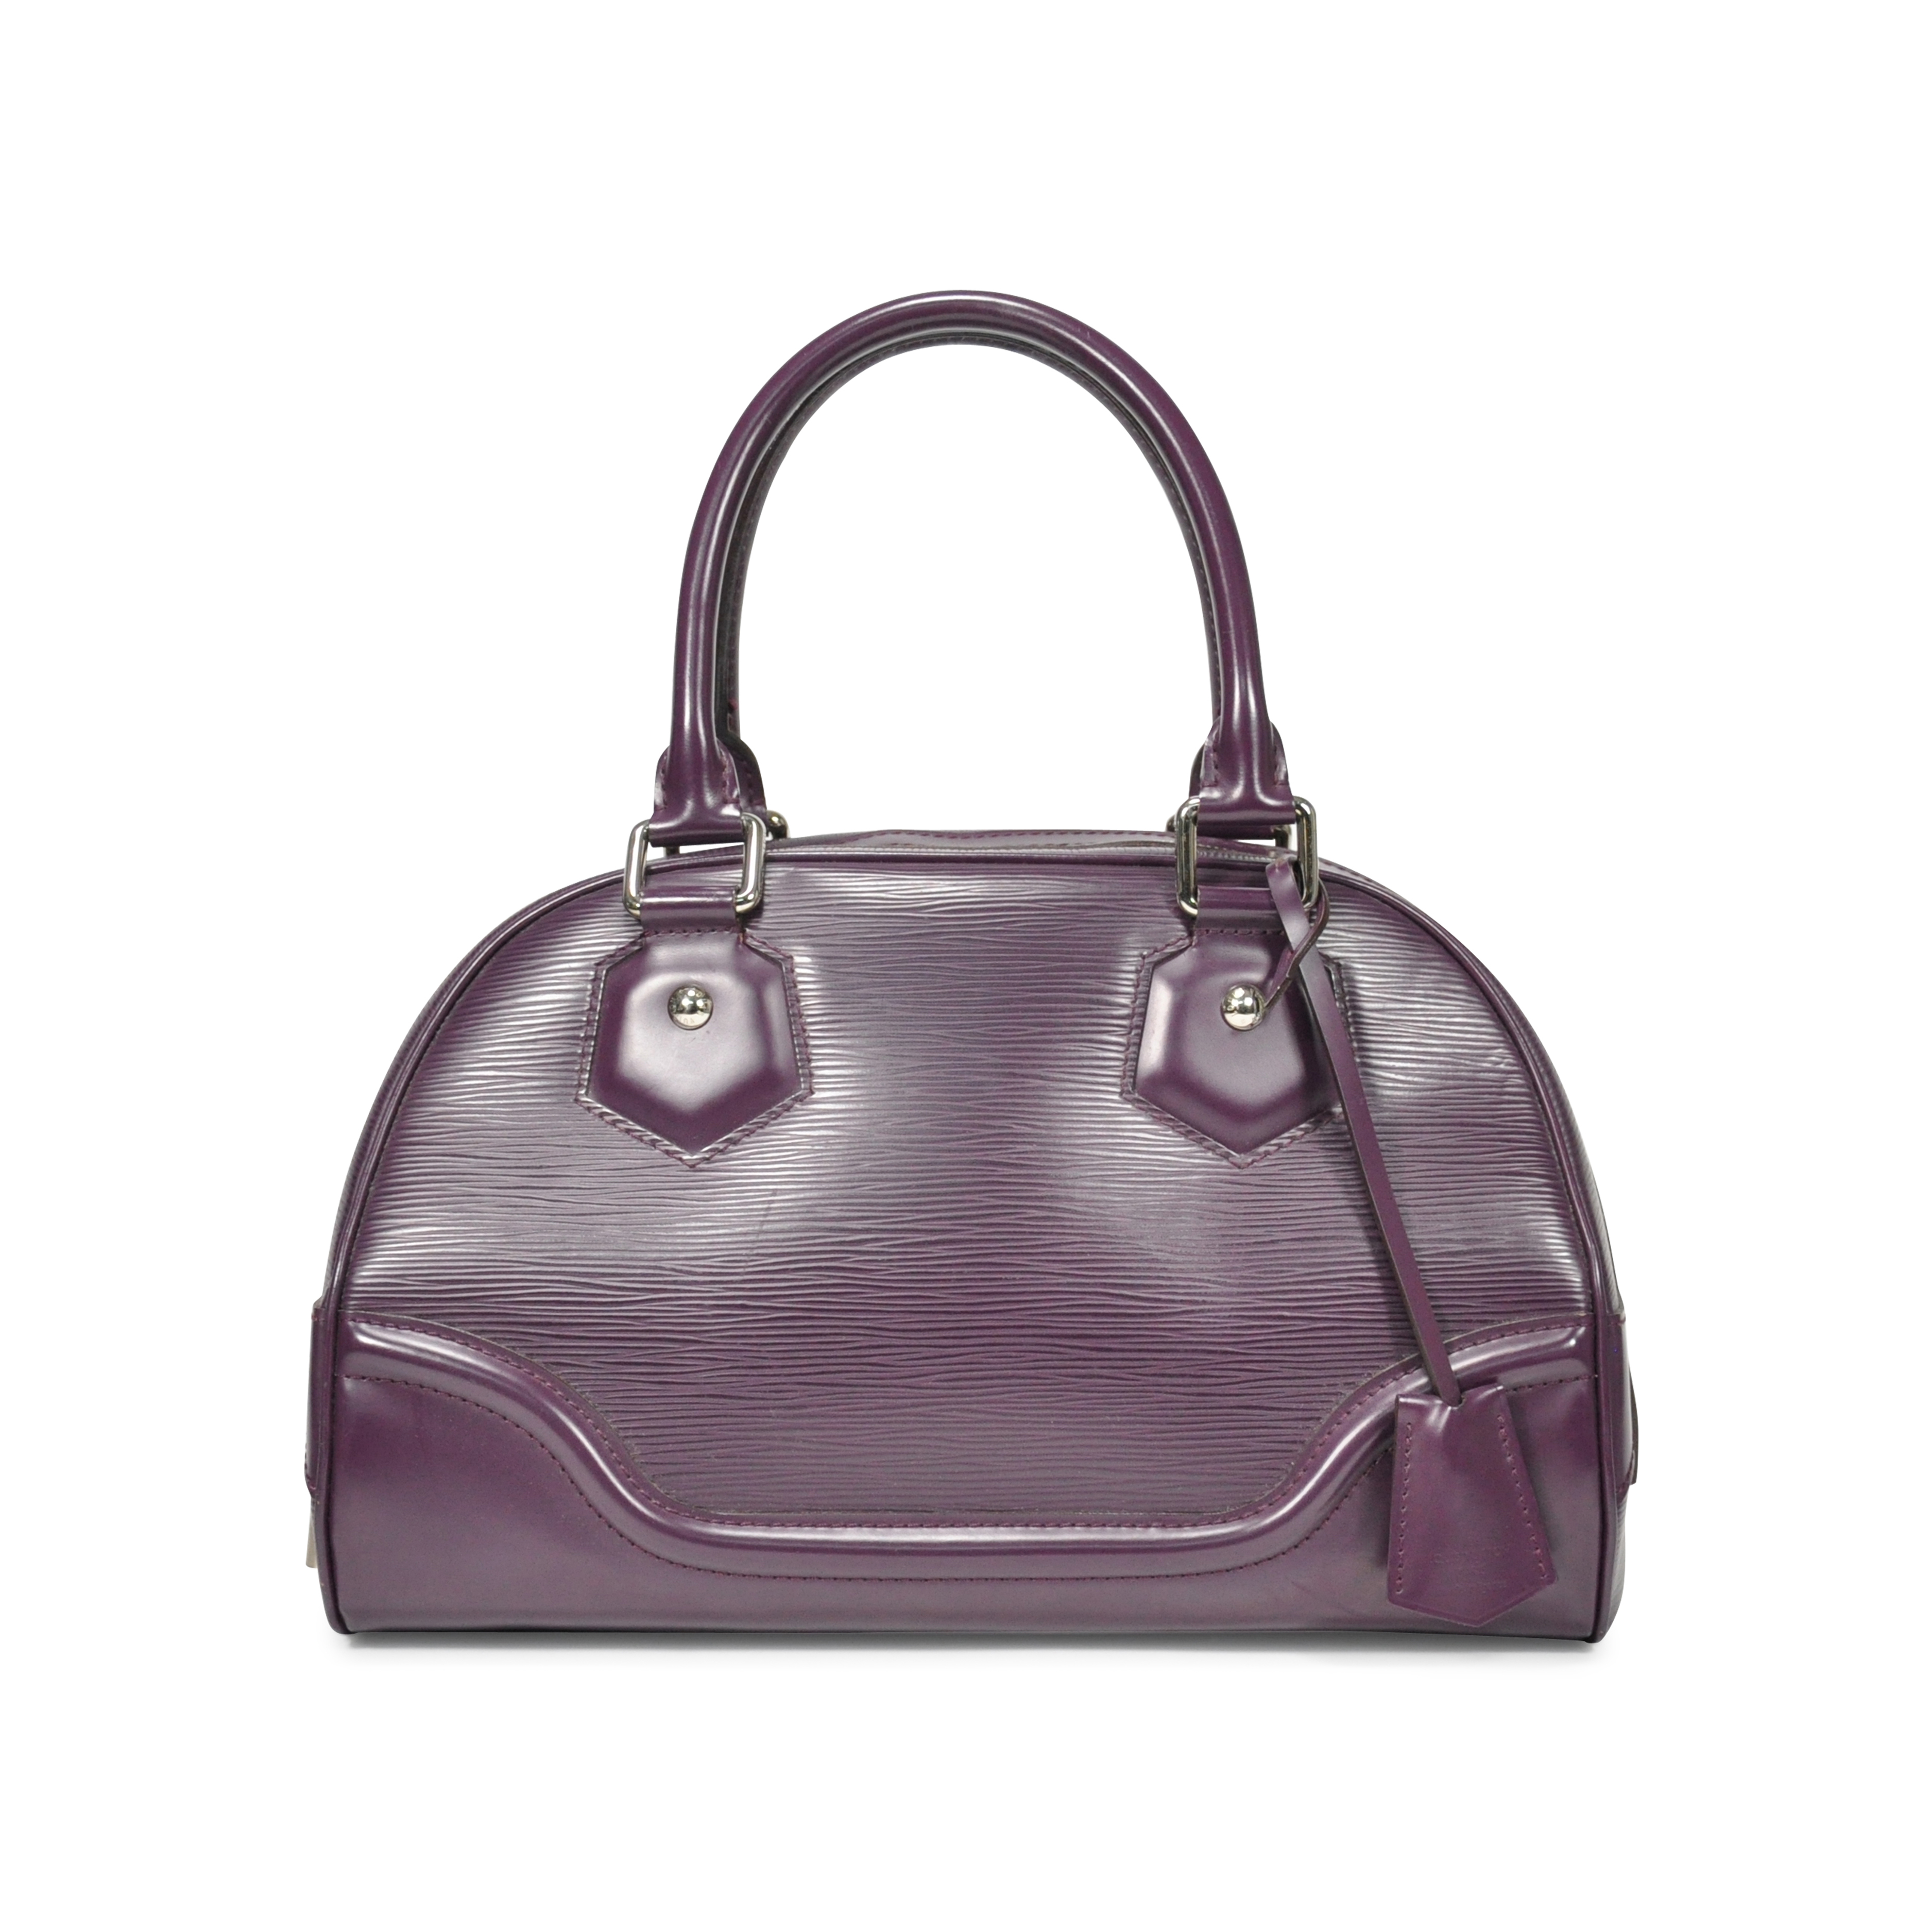 a522664821df Authentic Second Hand Louis Vuitton Epi Leather Bowling Montaigne Bag  (PSS-237-00005)